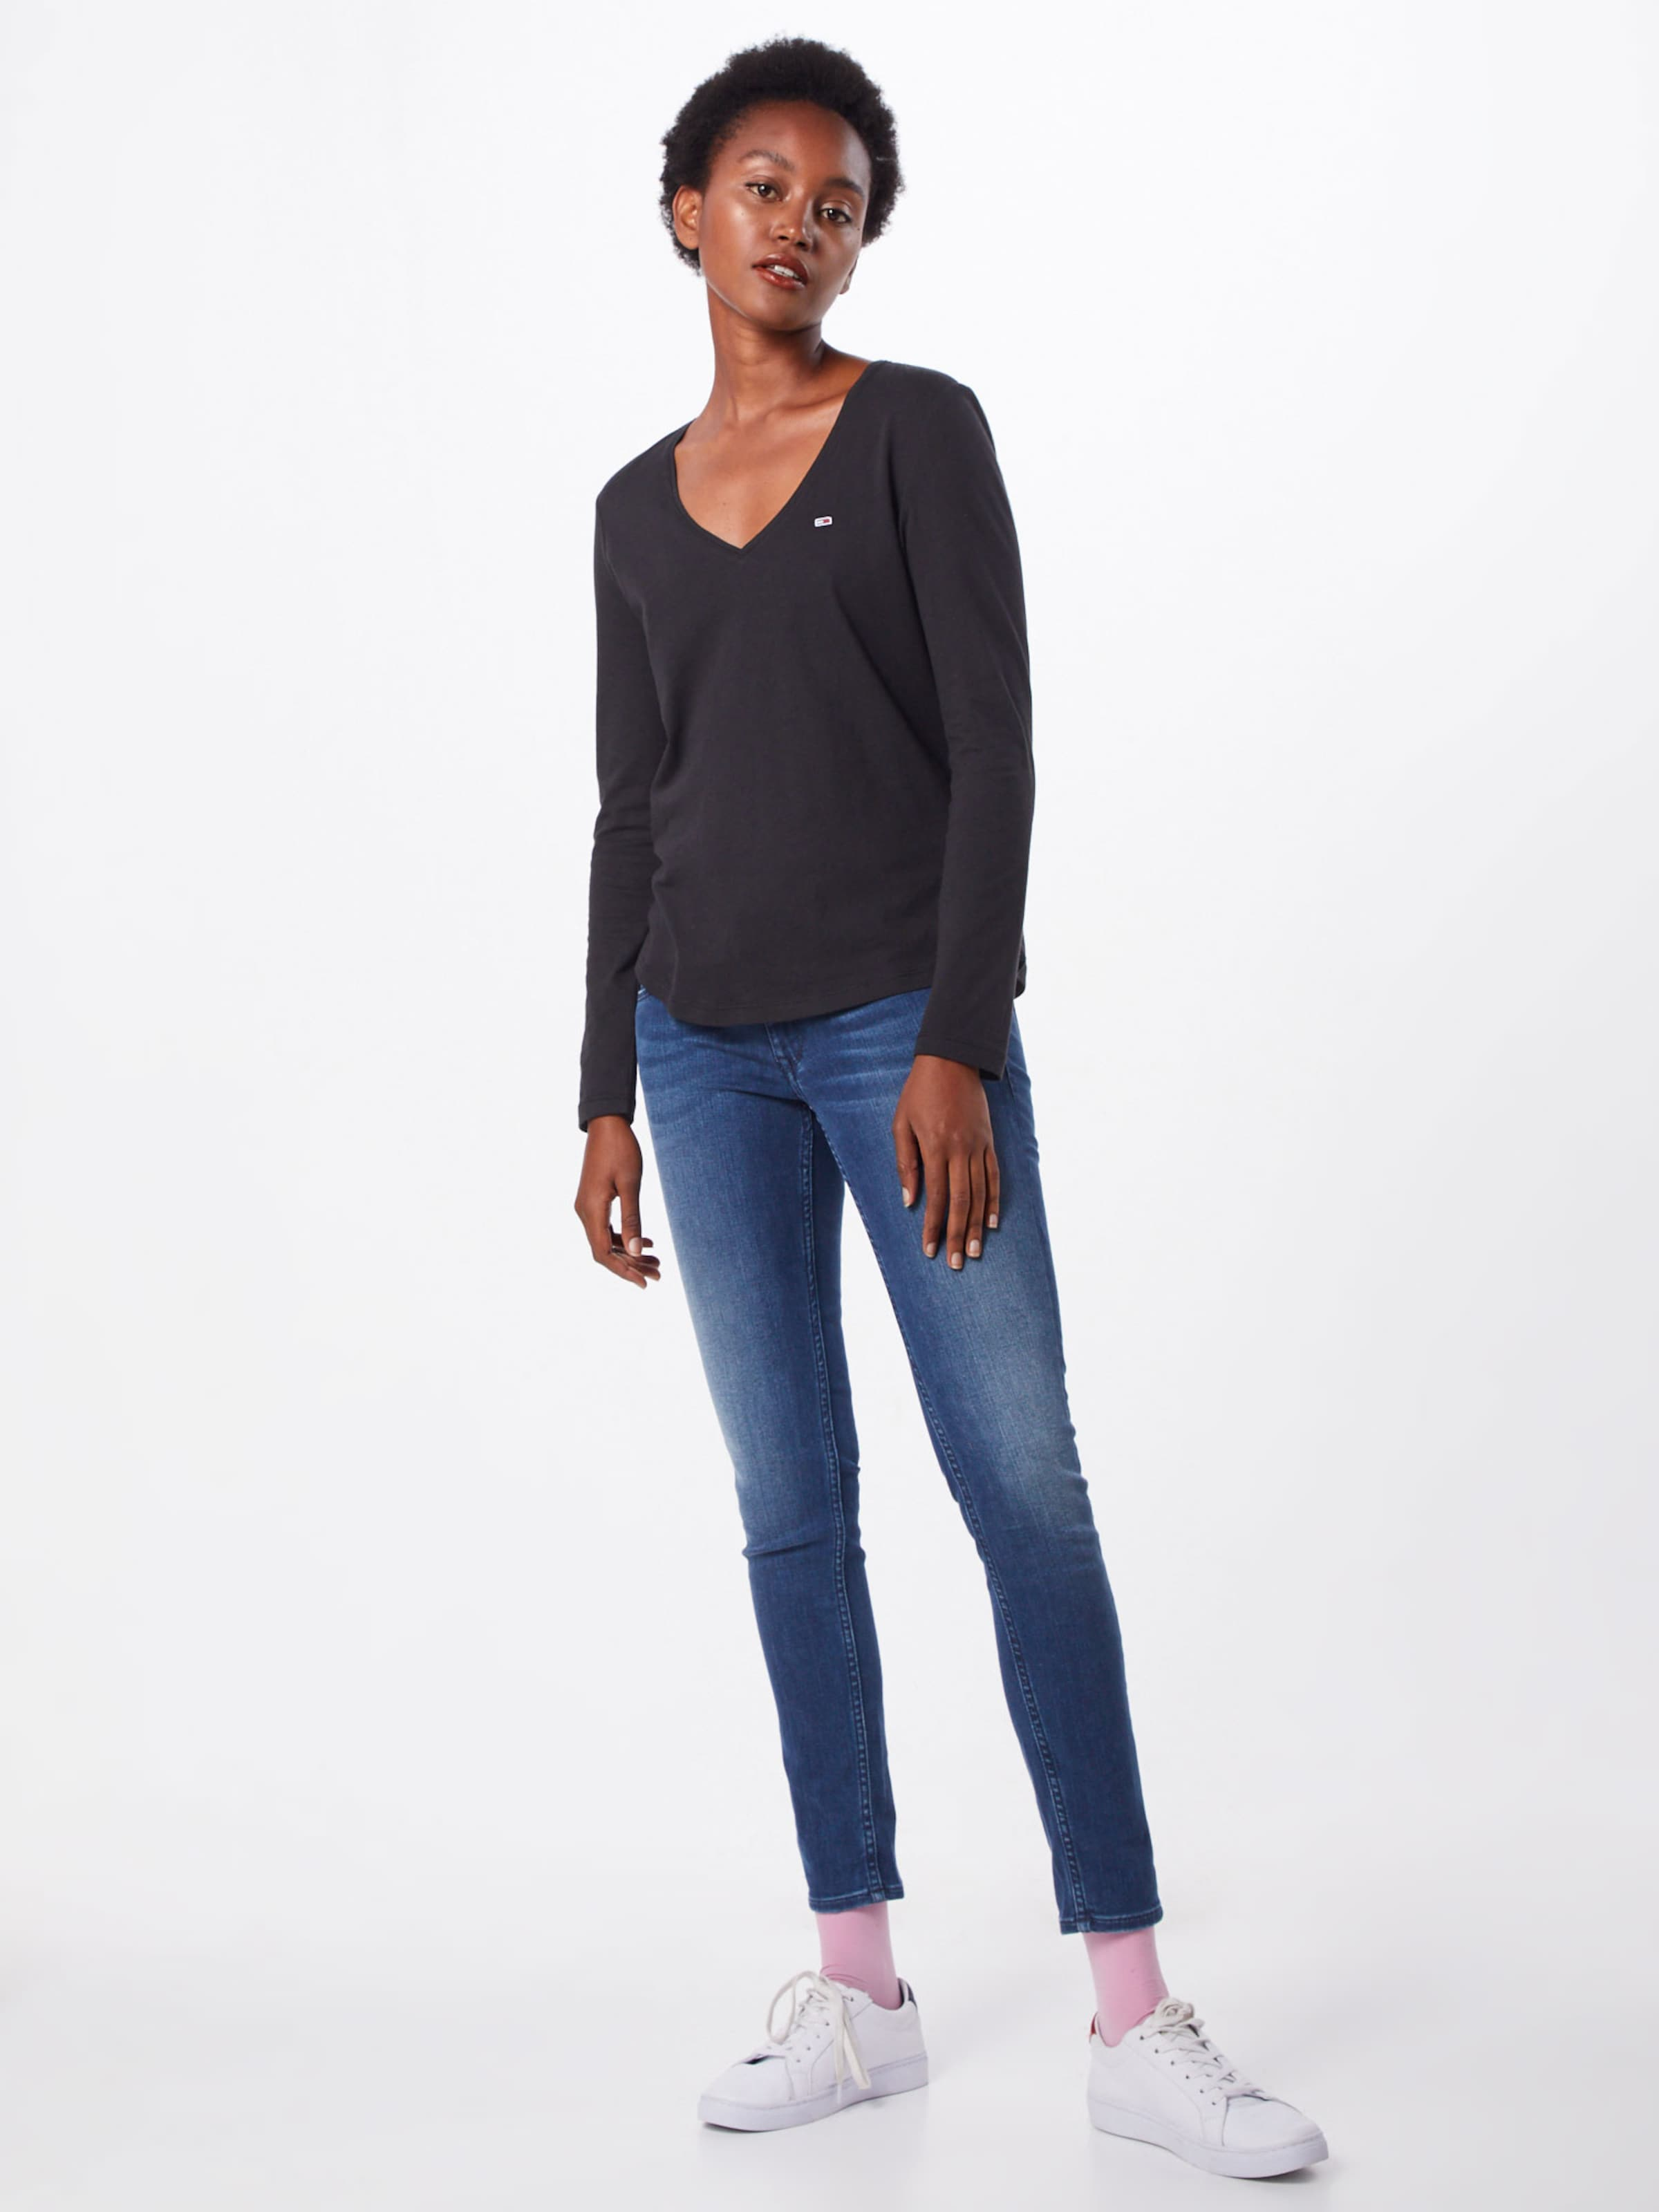 Schwarz Jeans neck Soft Tommy 'tjw Shirt V Longsleeve' In rxdCBoe